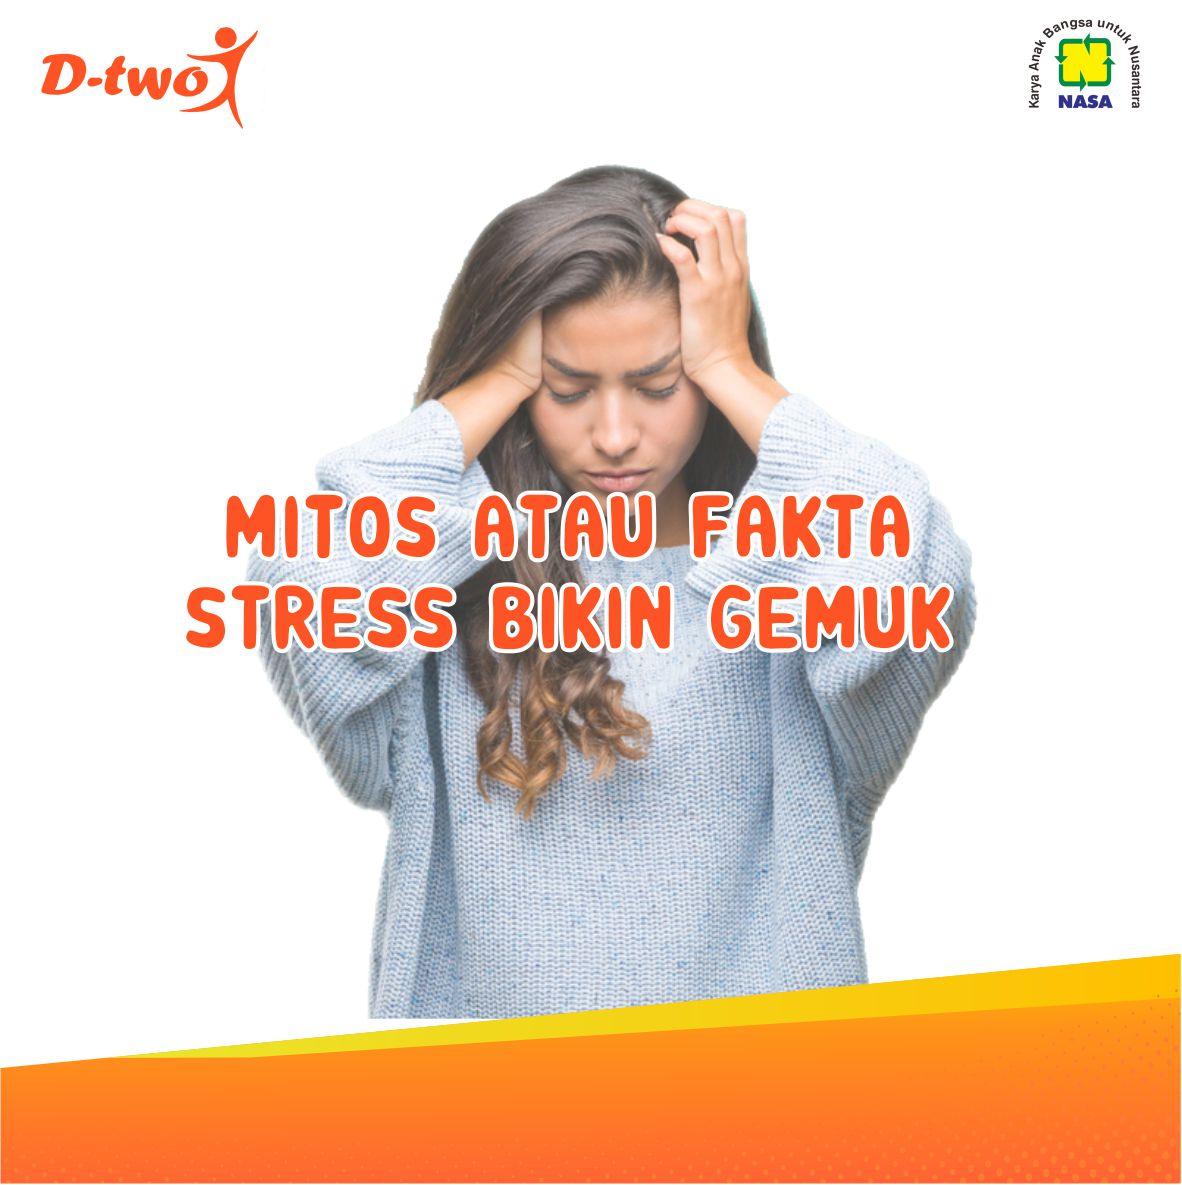 MITOS ATAU FAKTA STRESS BIKIN GEMUK